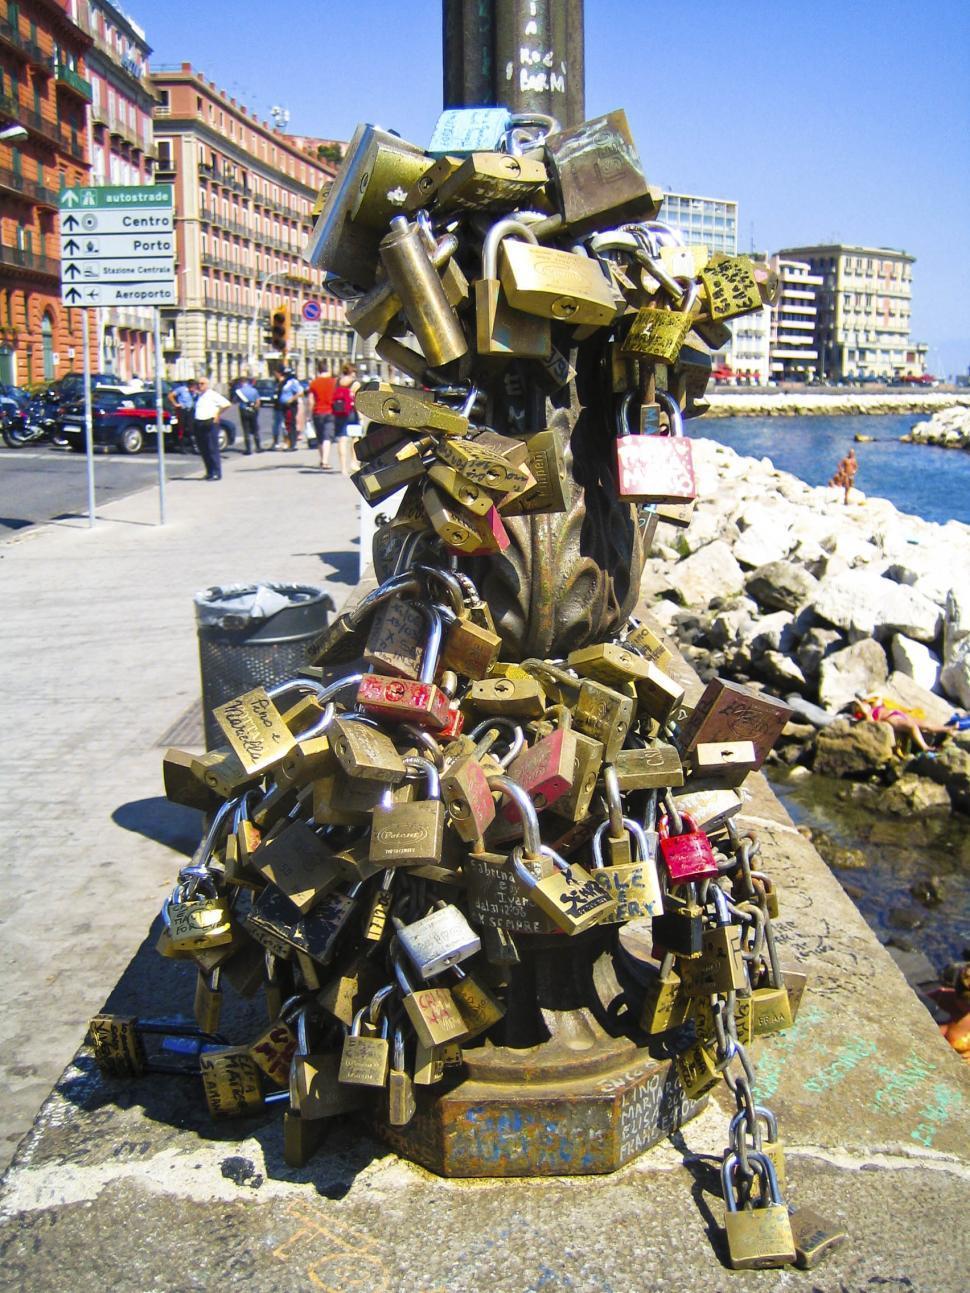 Download Free Stock HD Photo of Napoli locks Online